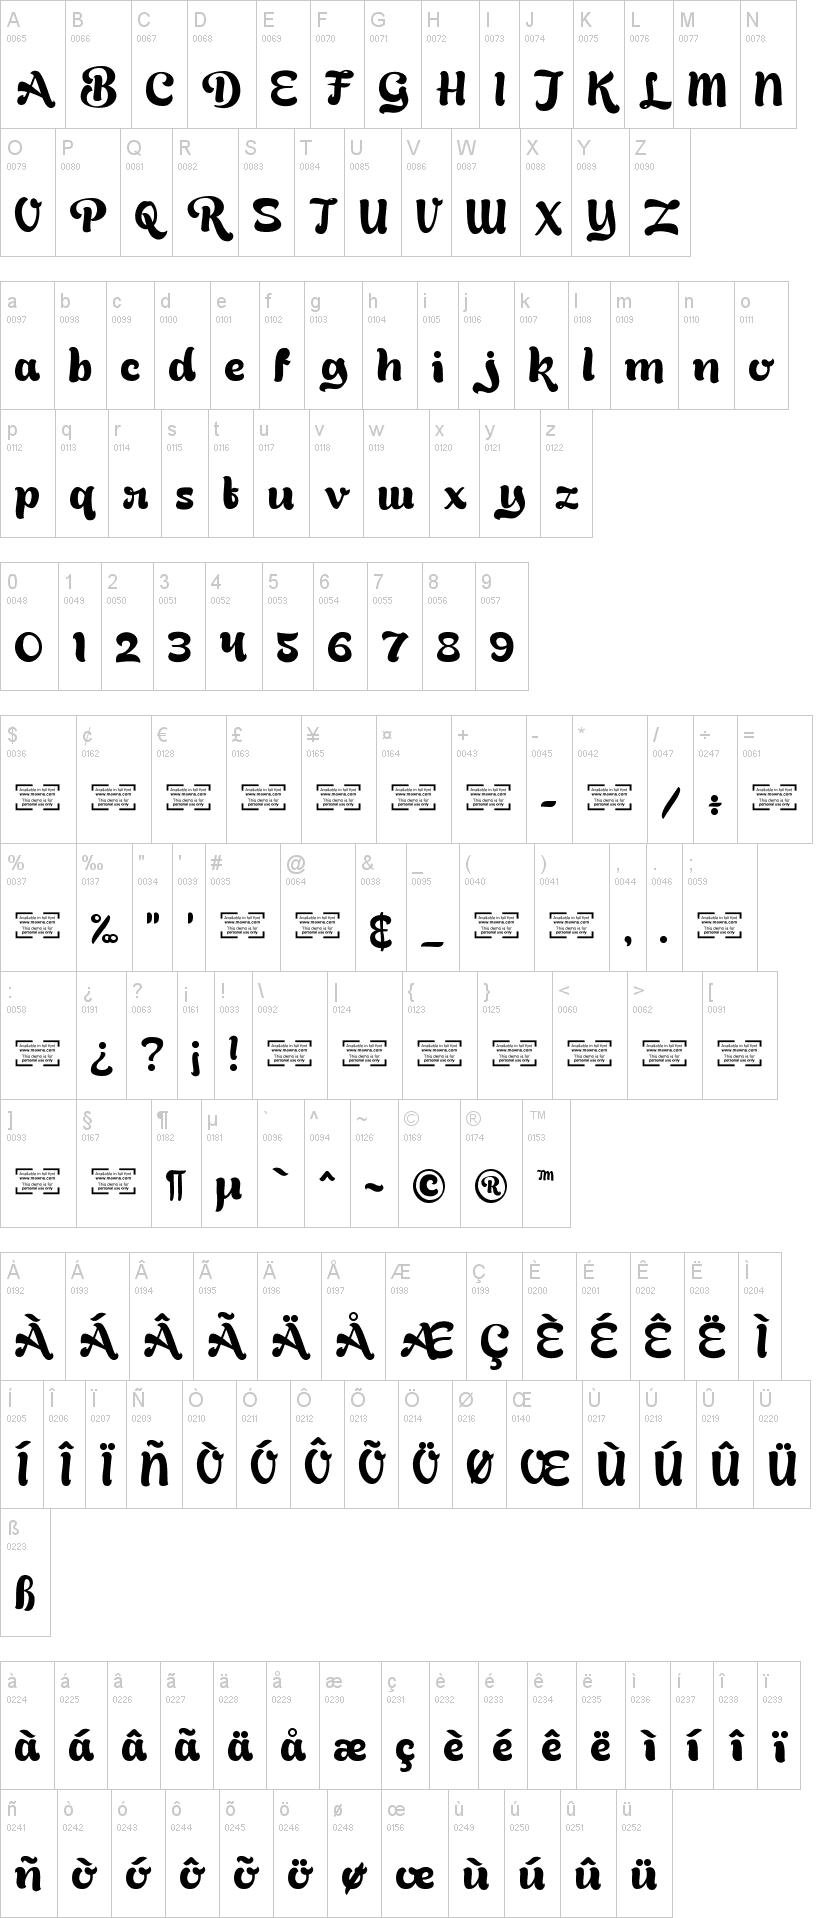 bready clockwise font